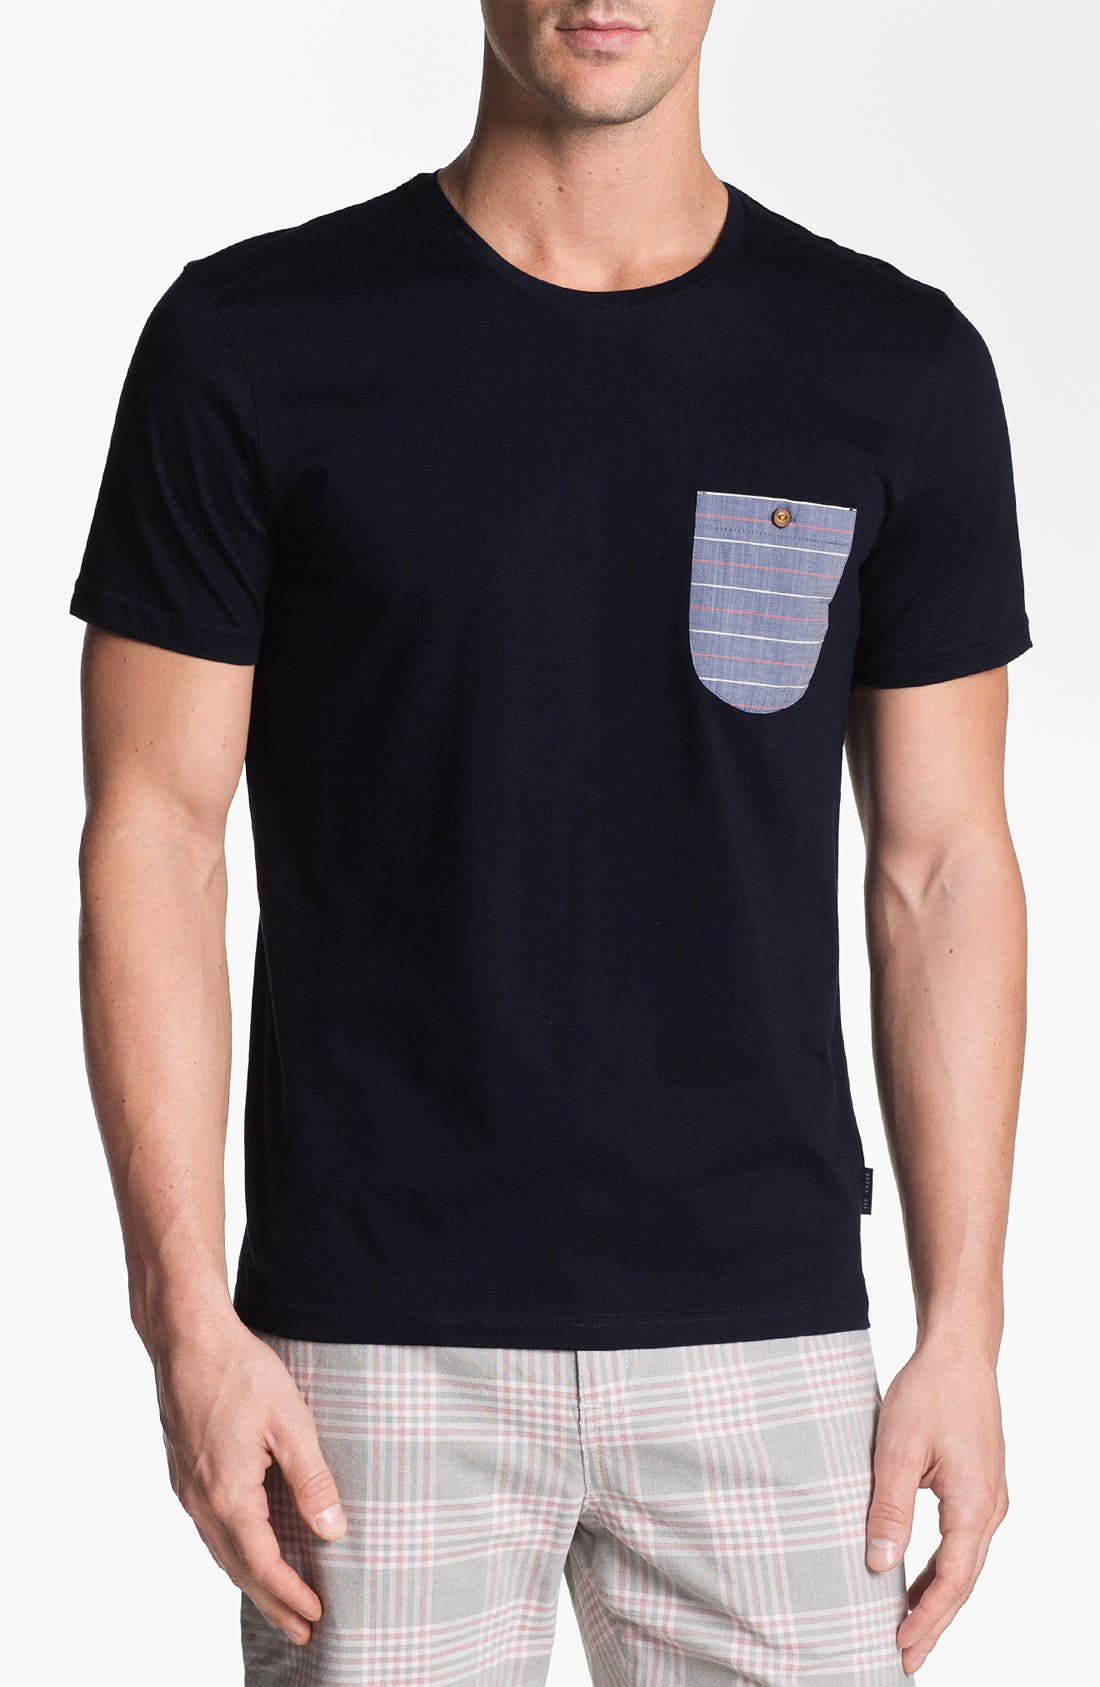 Alternate Image 1 Selected - Ted Baker London 'Mezsure' Pocket T-Shirt